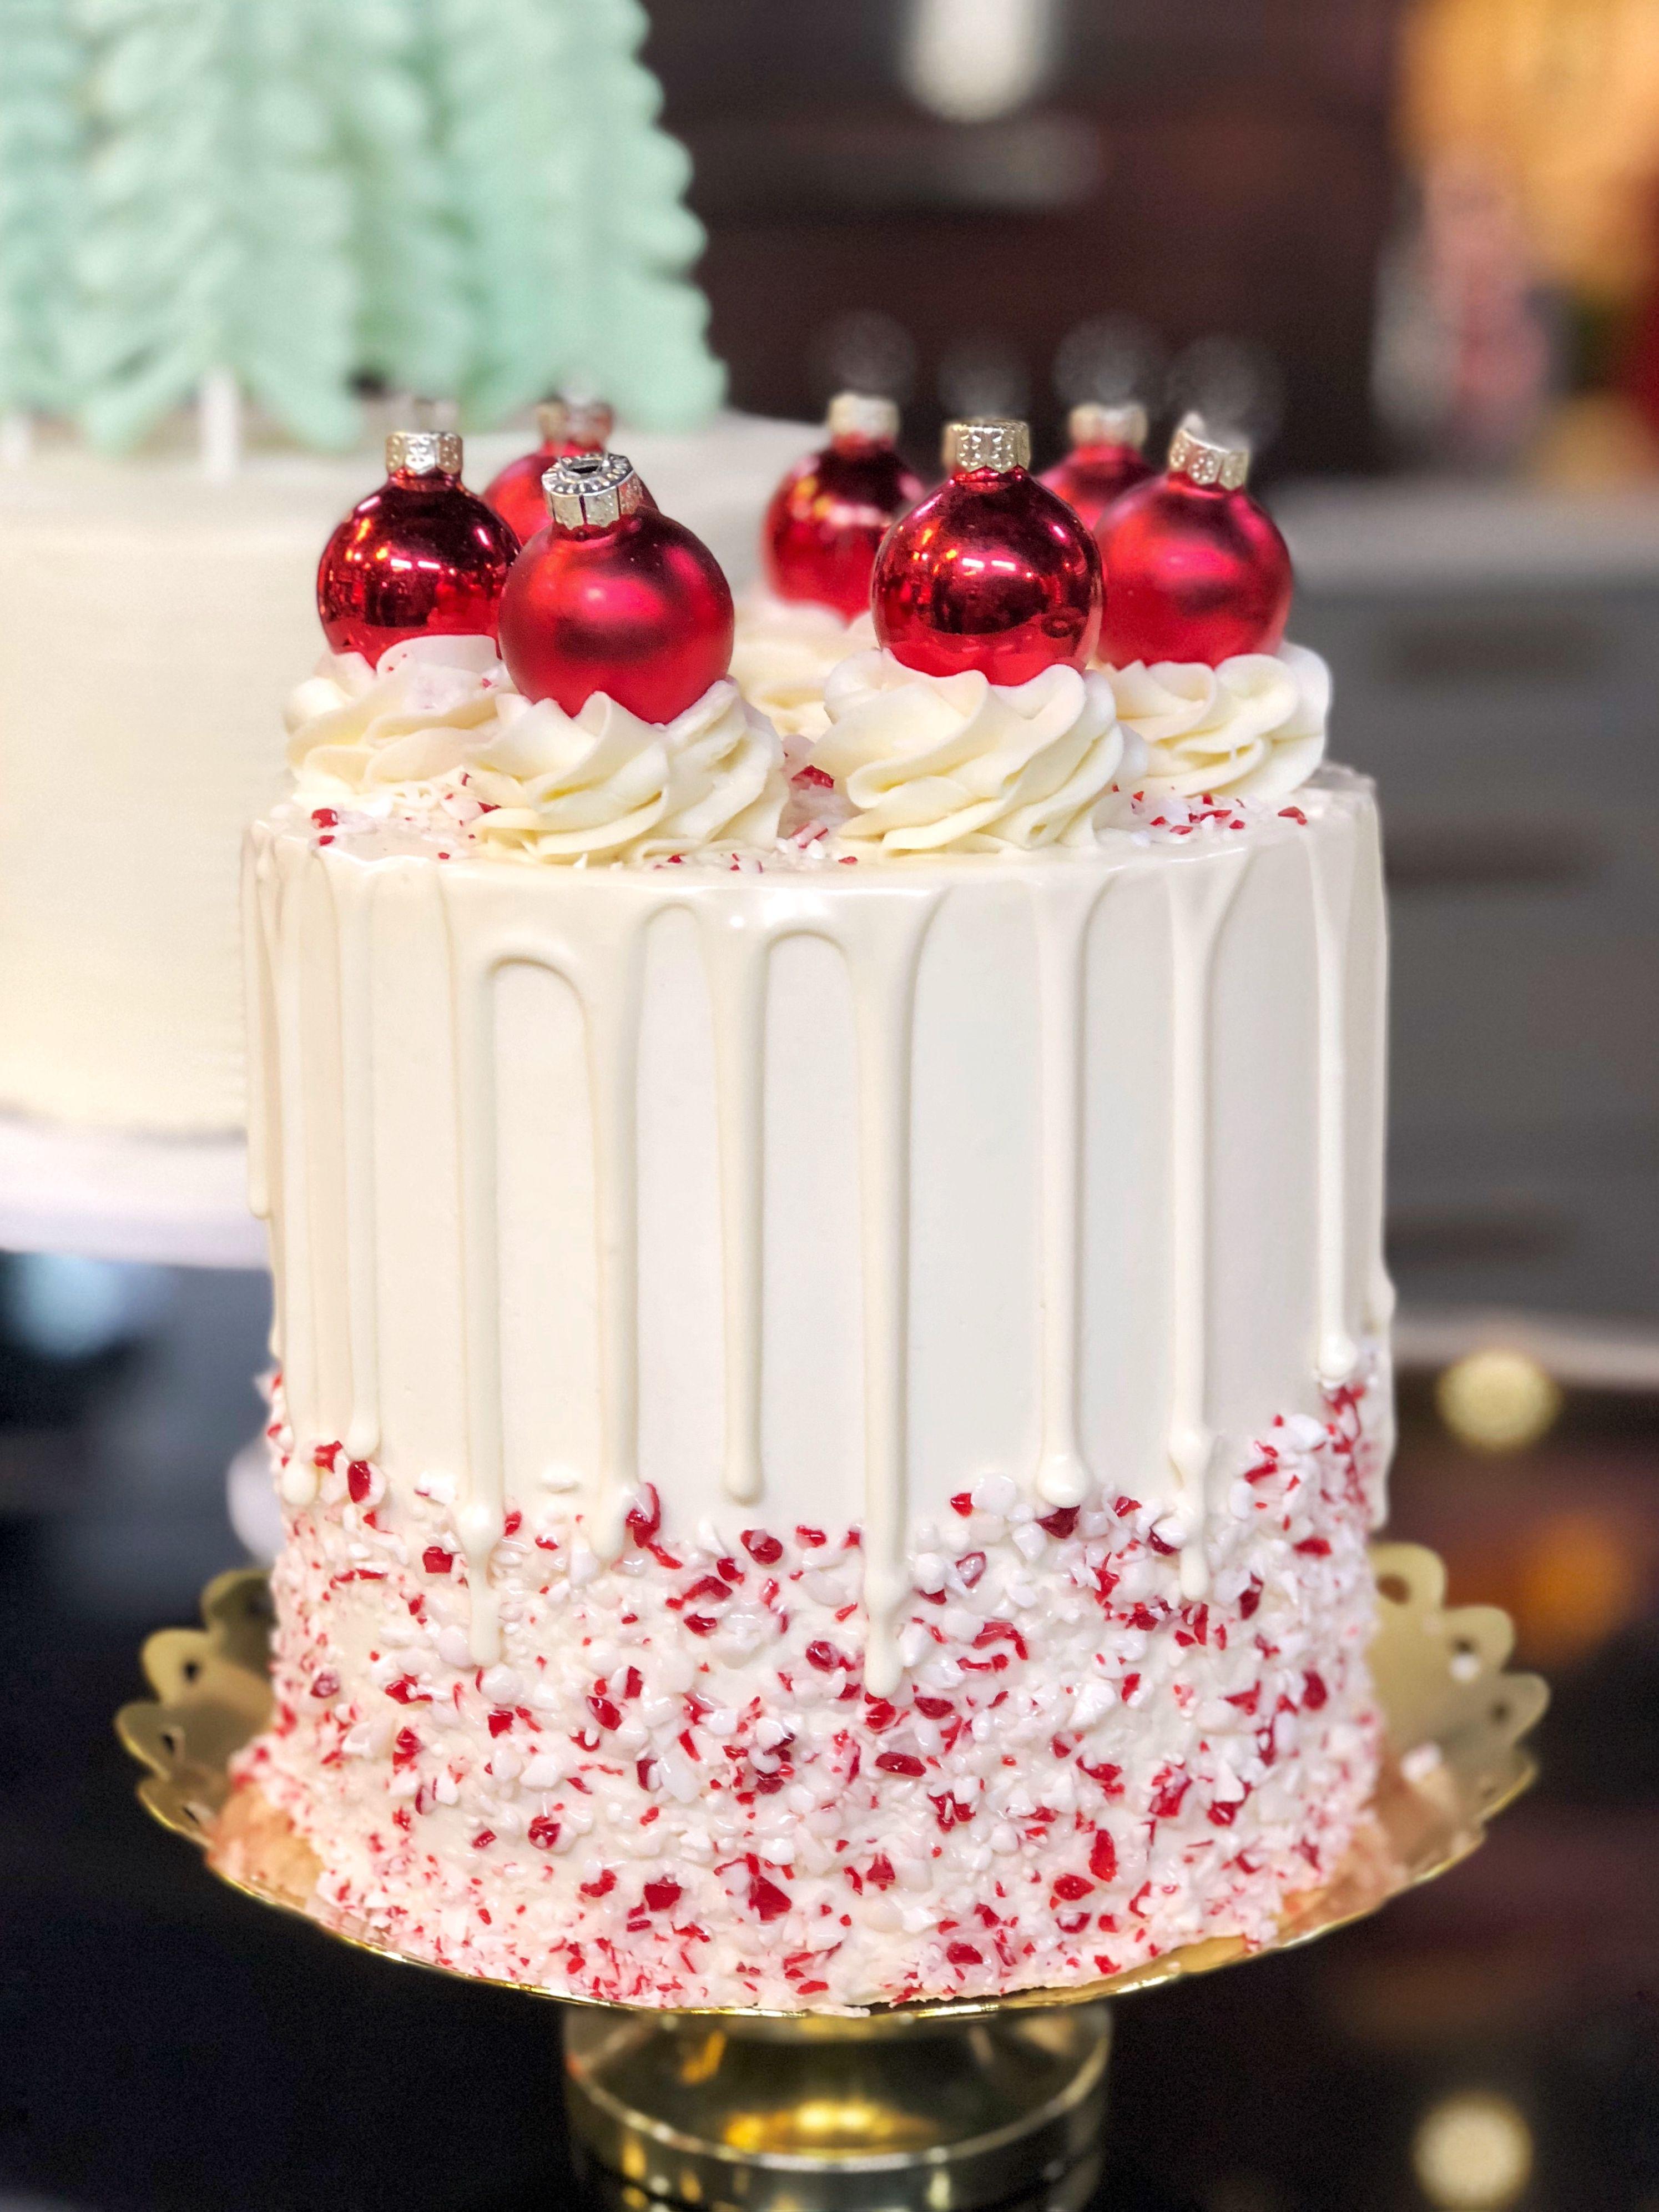 Christmas Cake Decorating Ideas Christmas cake